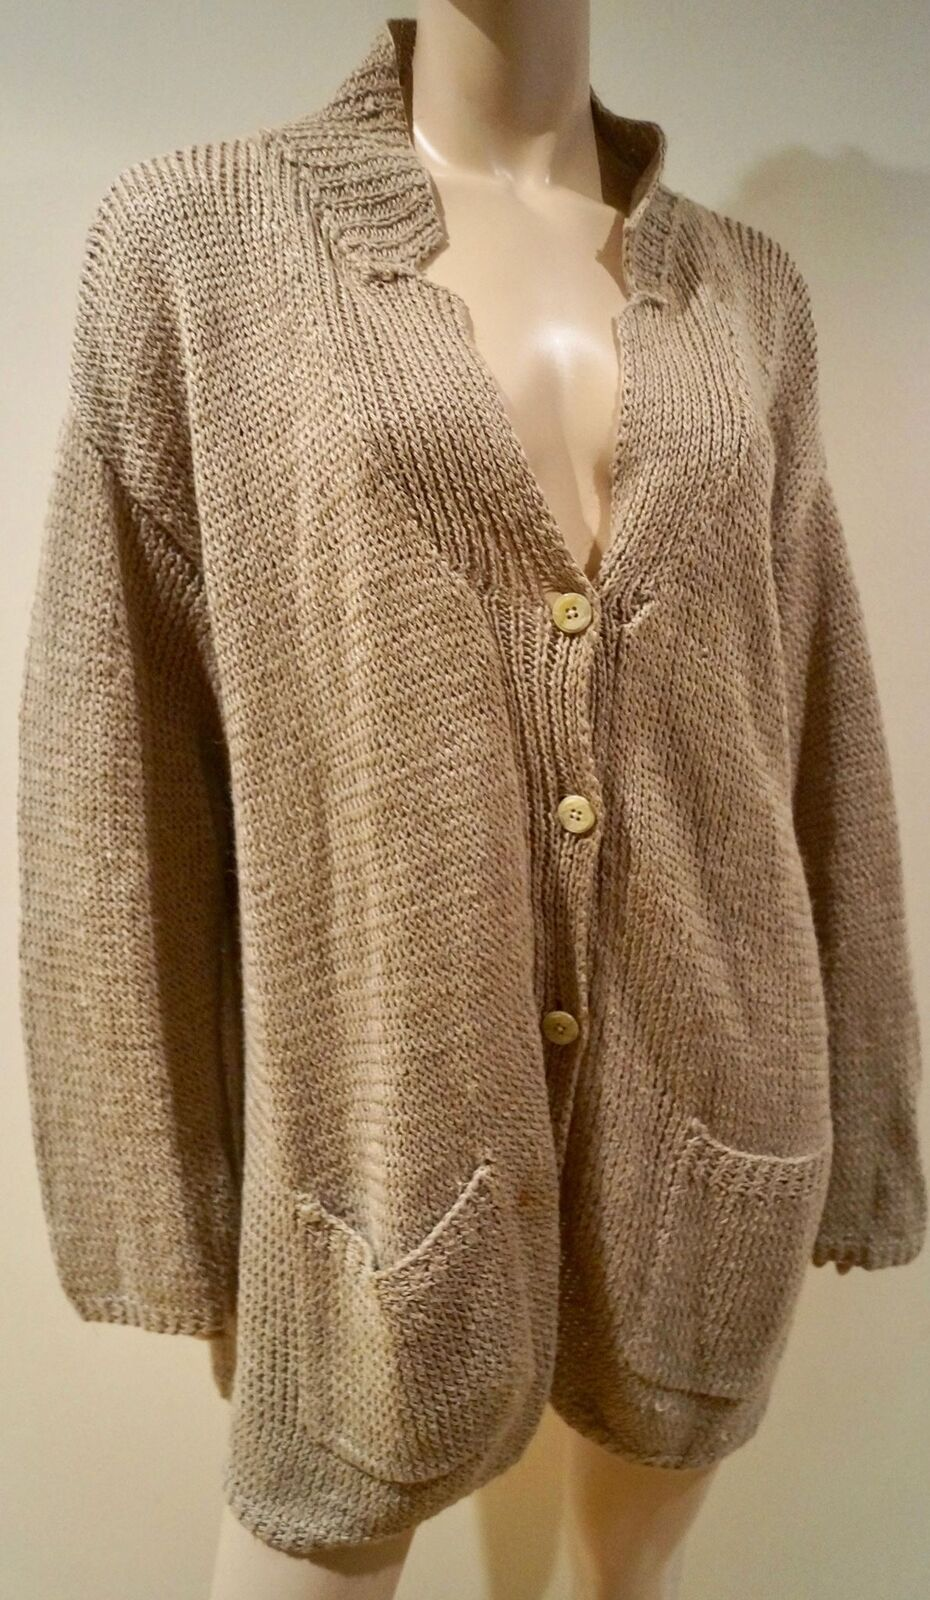 NICOLE FARHI Beige Linen Loose Chunky Knit Long Length Slouchy Cardigan Top Sz M